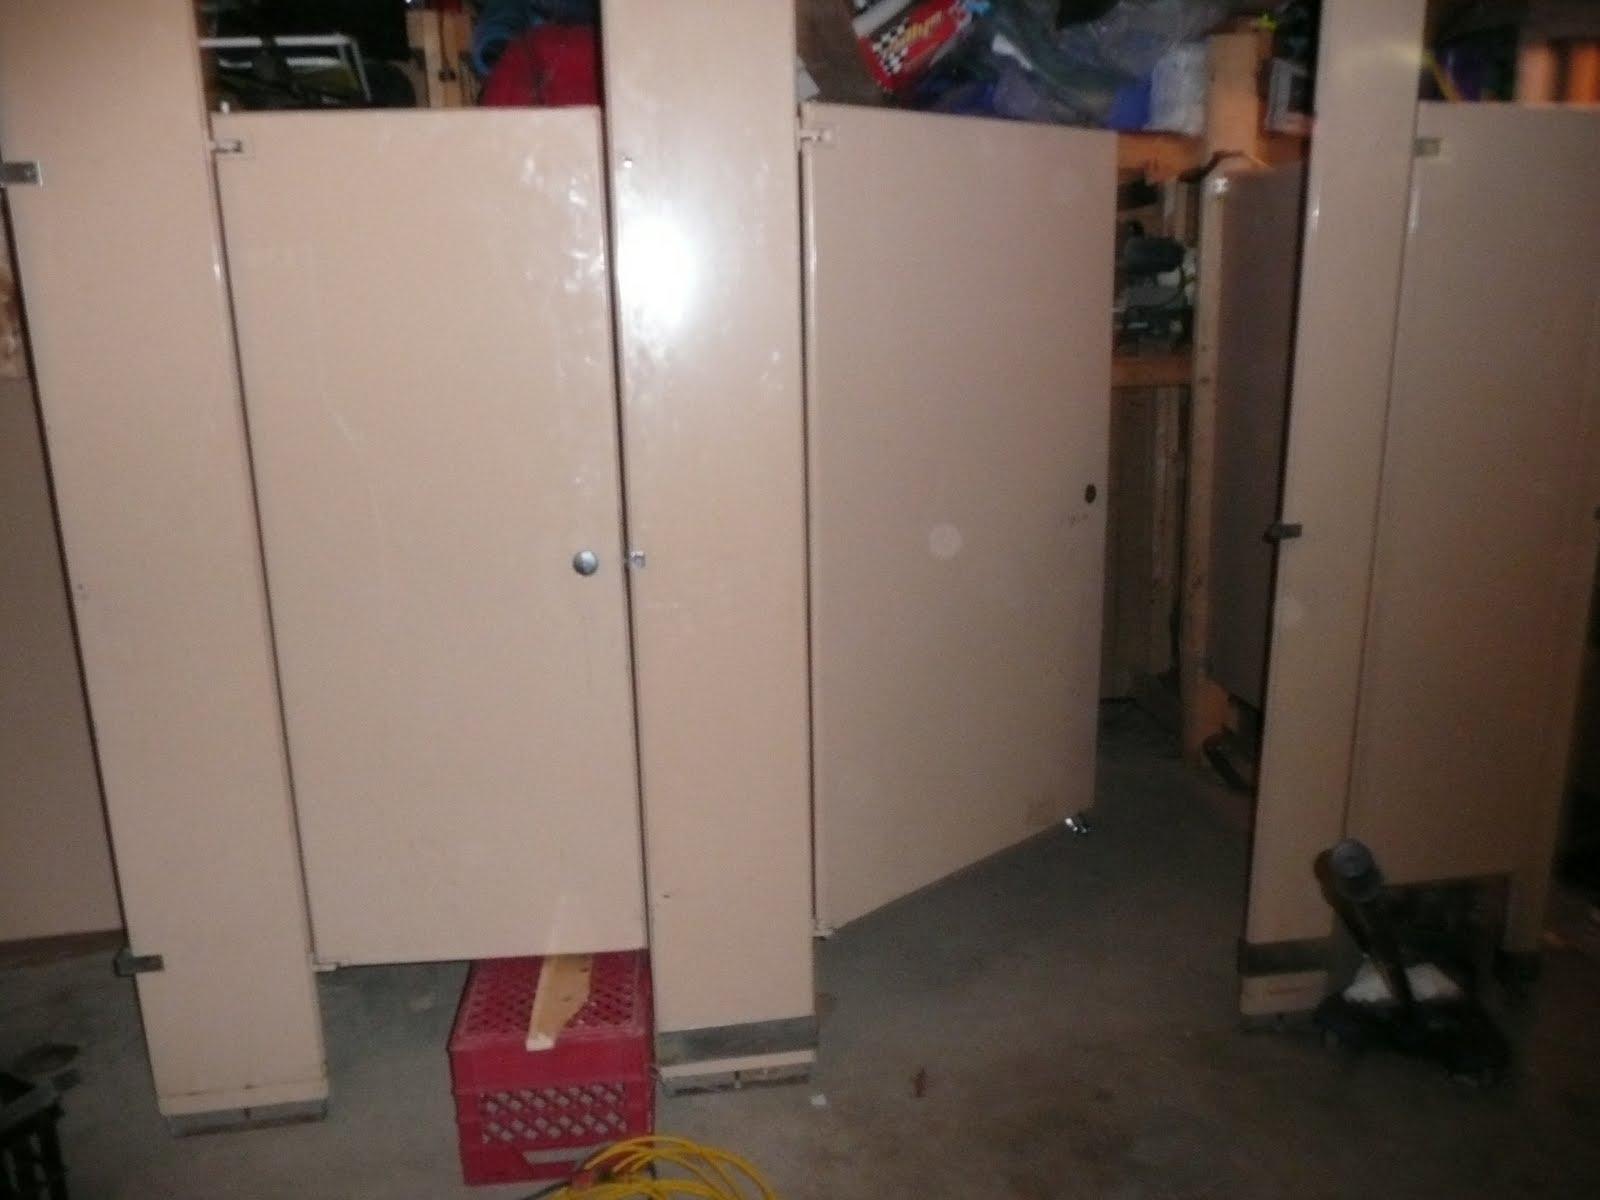 To Remove Bathroom Stall Doors - Madison Art Center Design